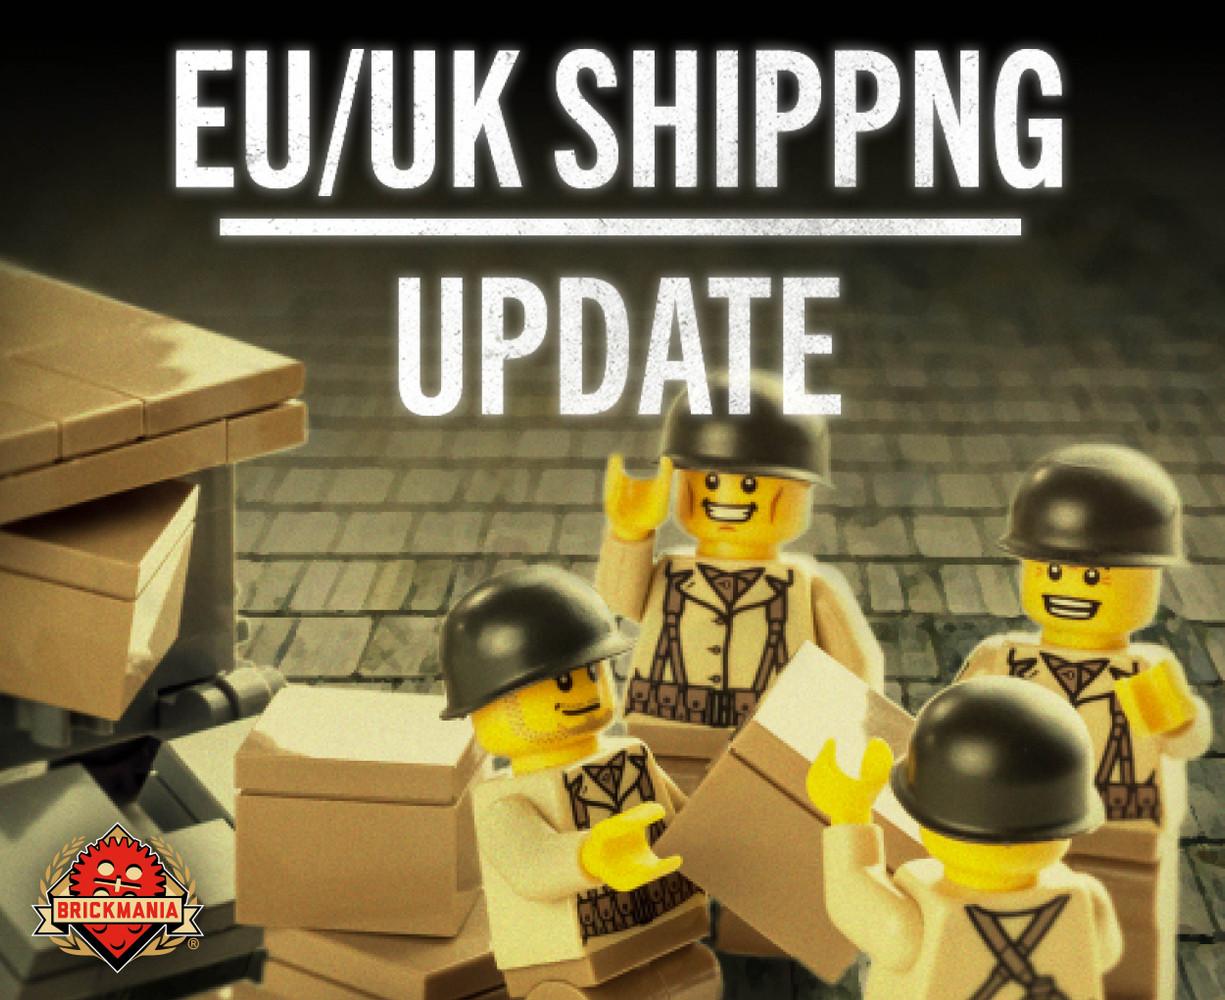 Shipping Notice for EU/UK Brickmaniacs!